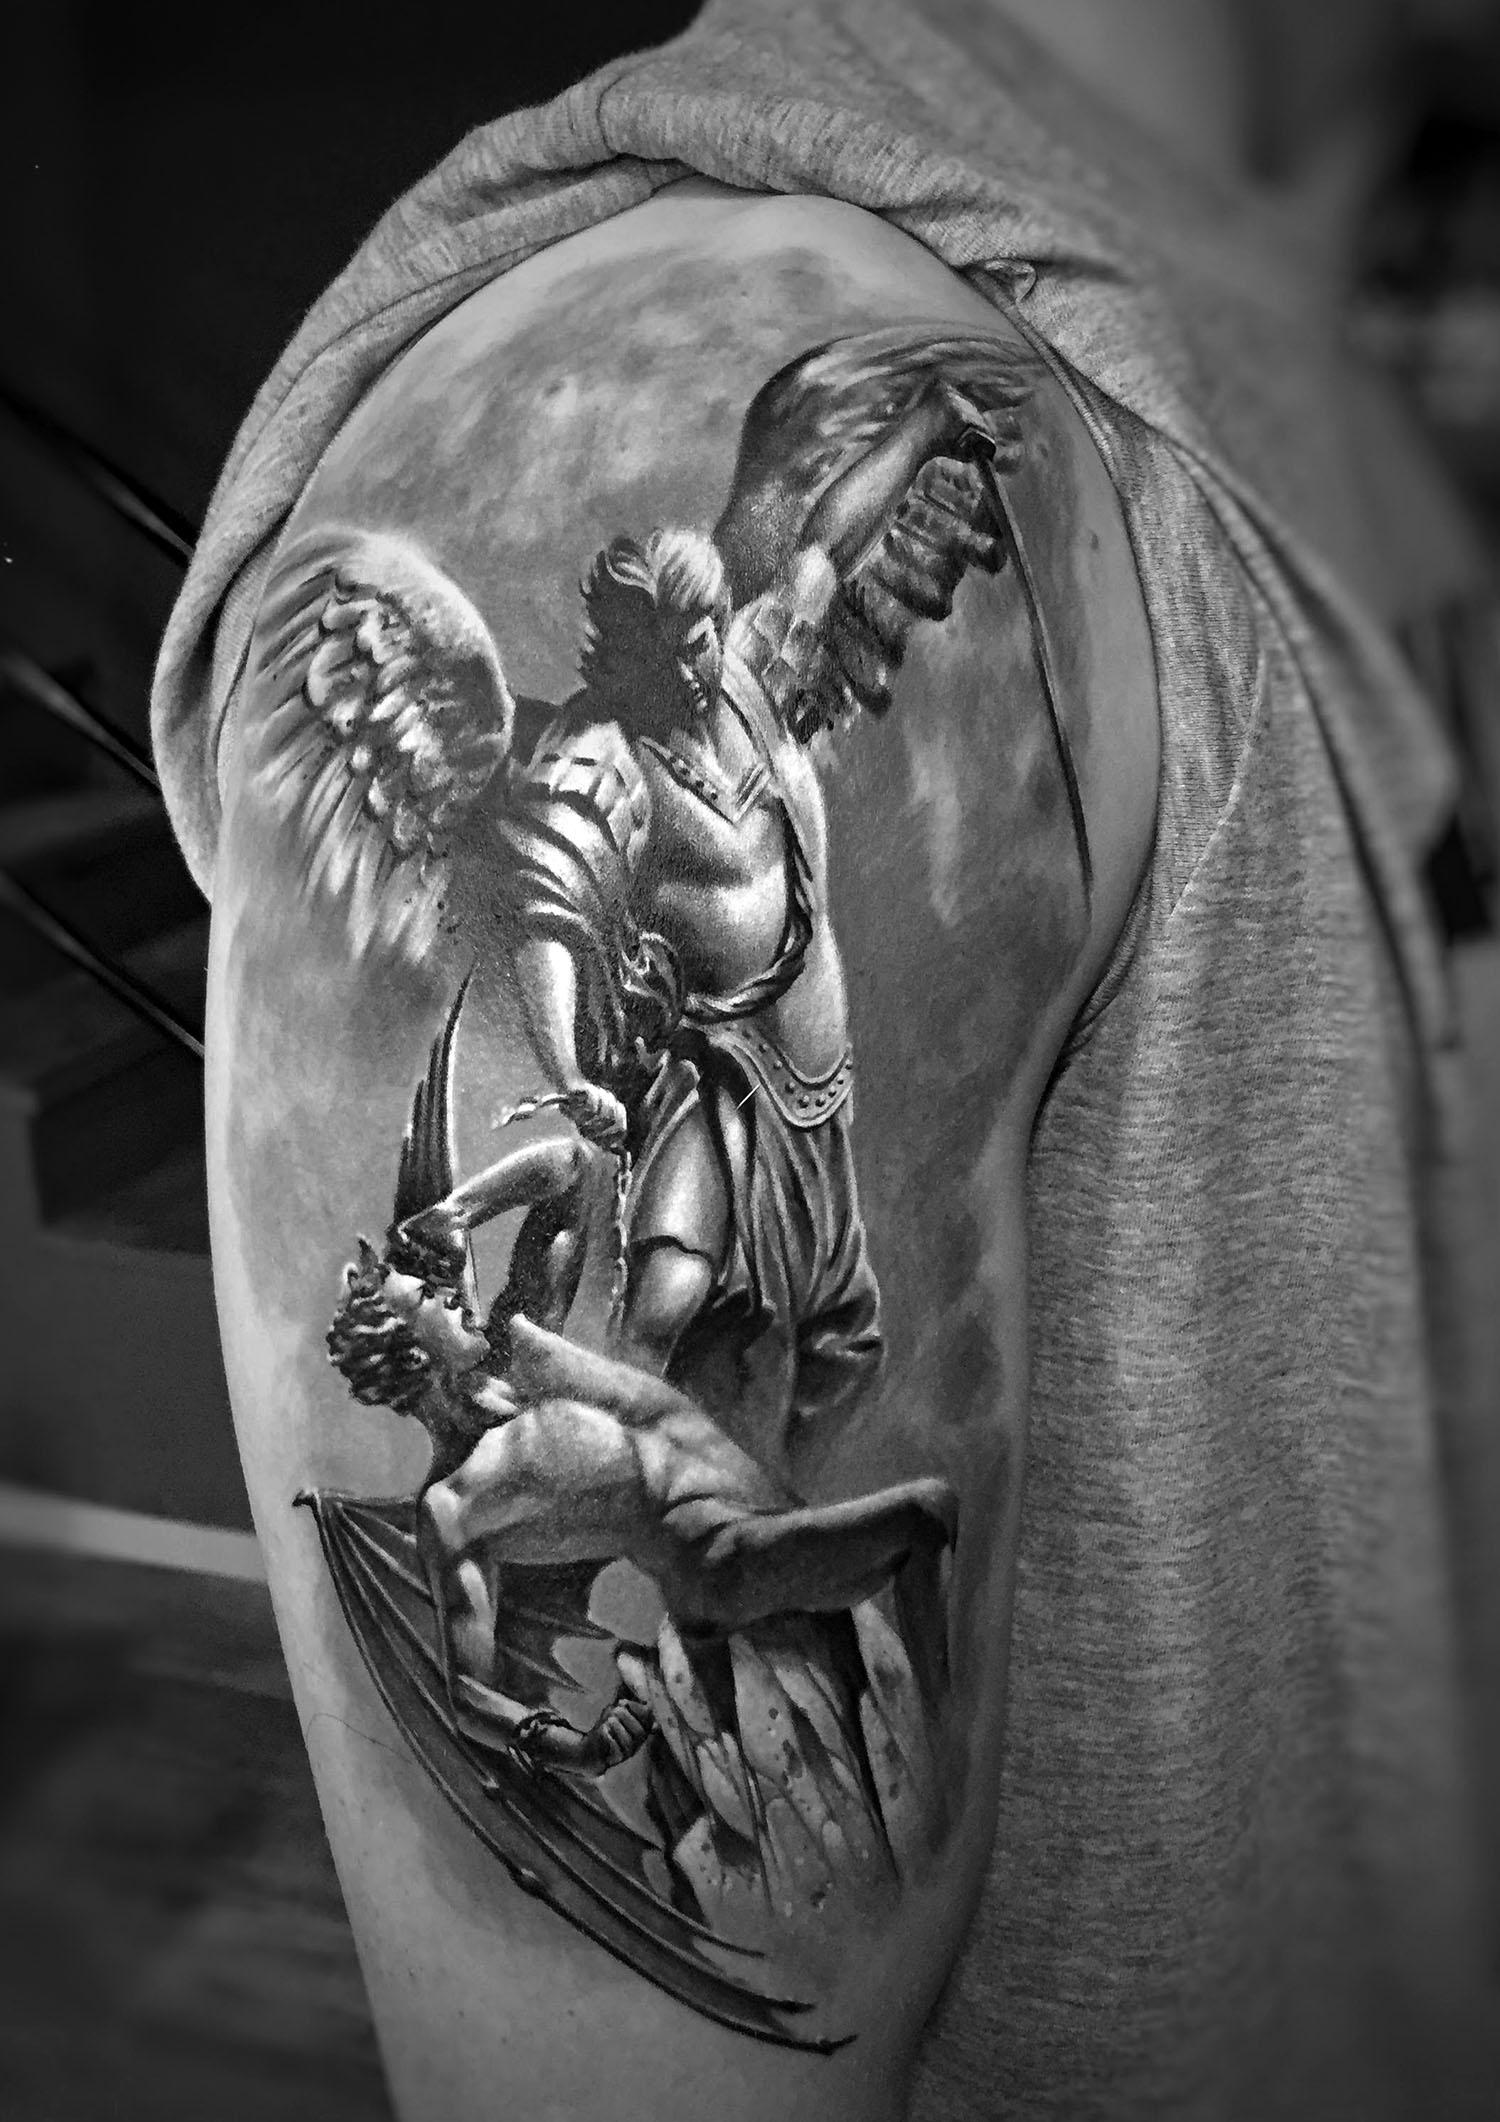 Hyperrealistic tattoo of an angel